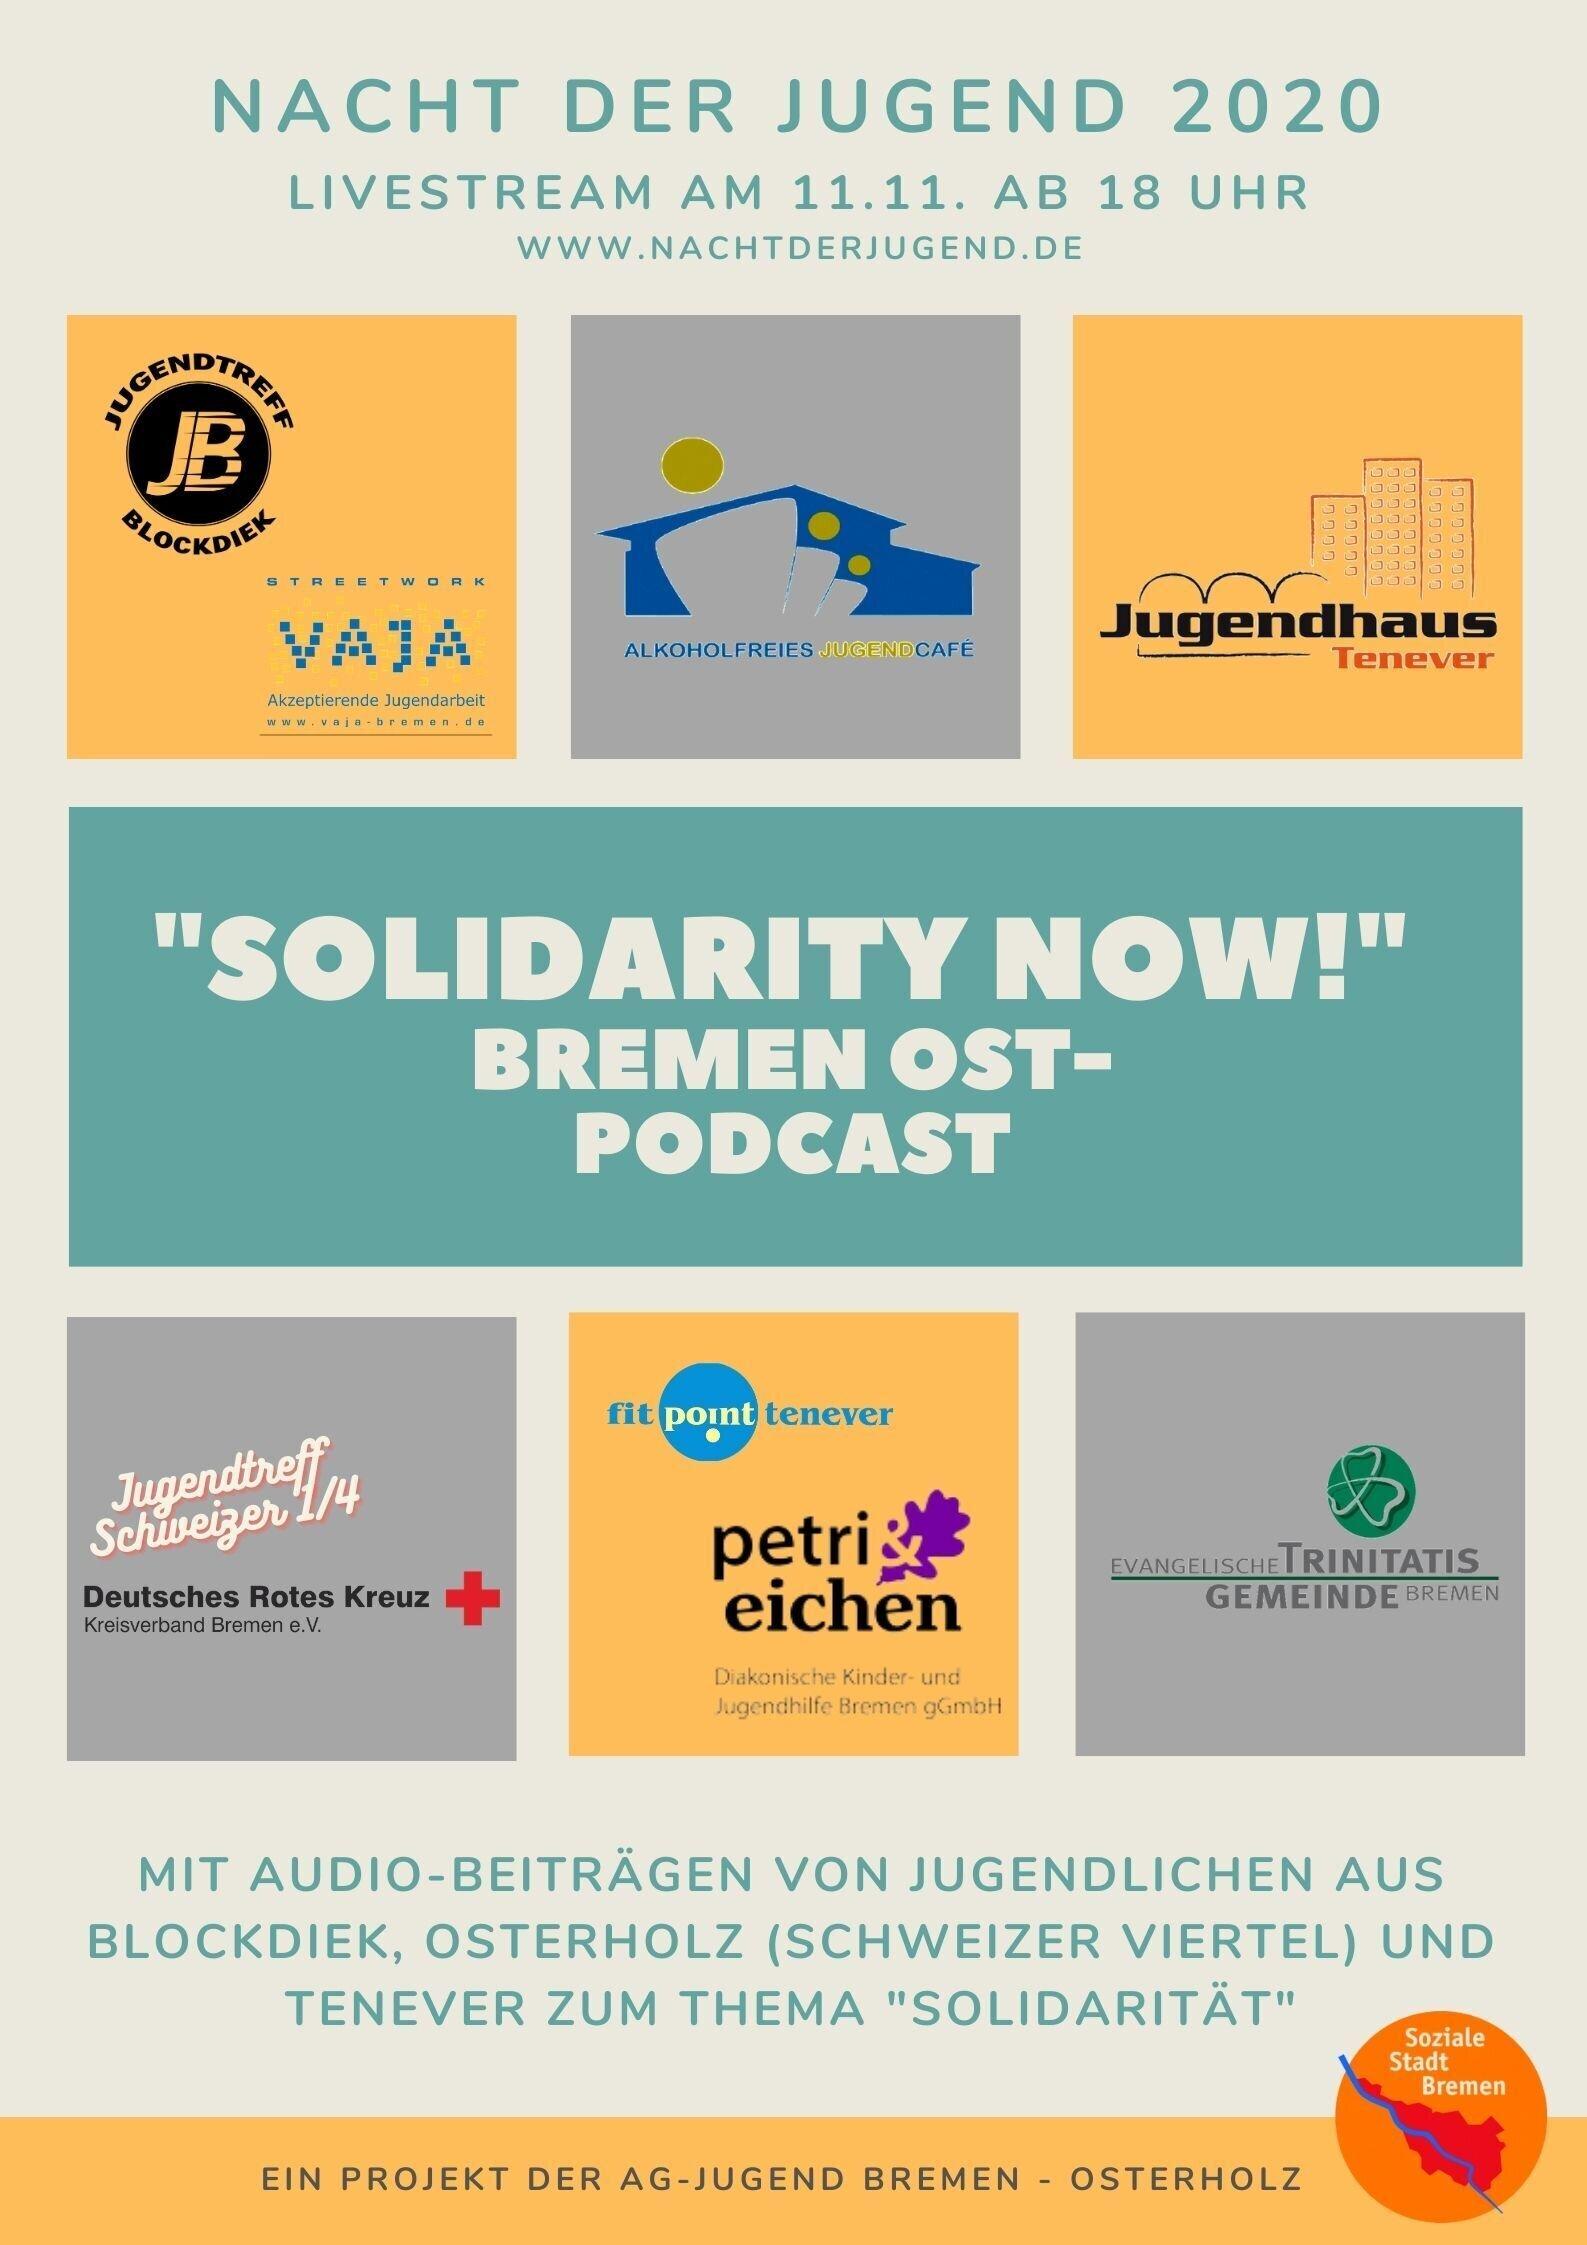 BremenOstPodcast